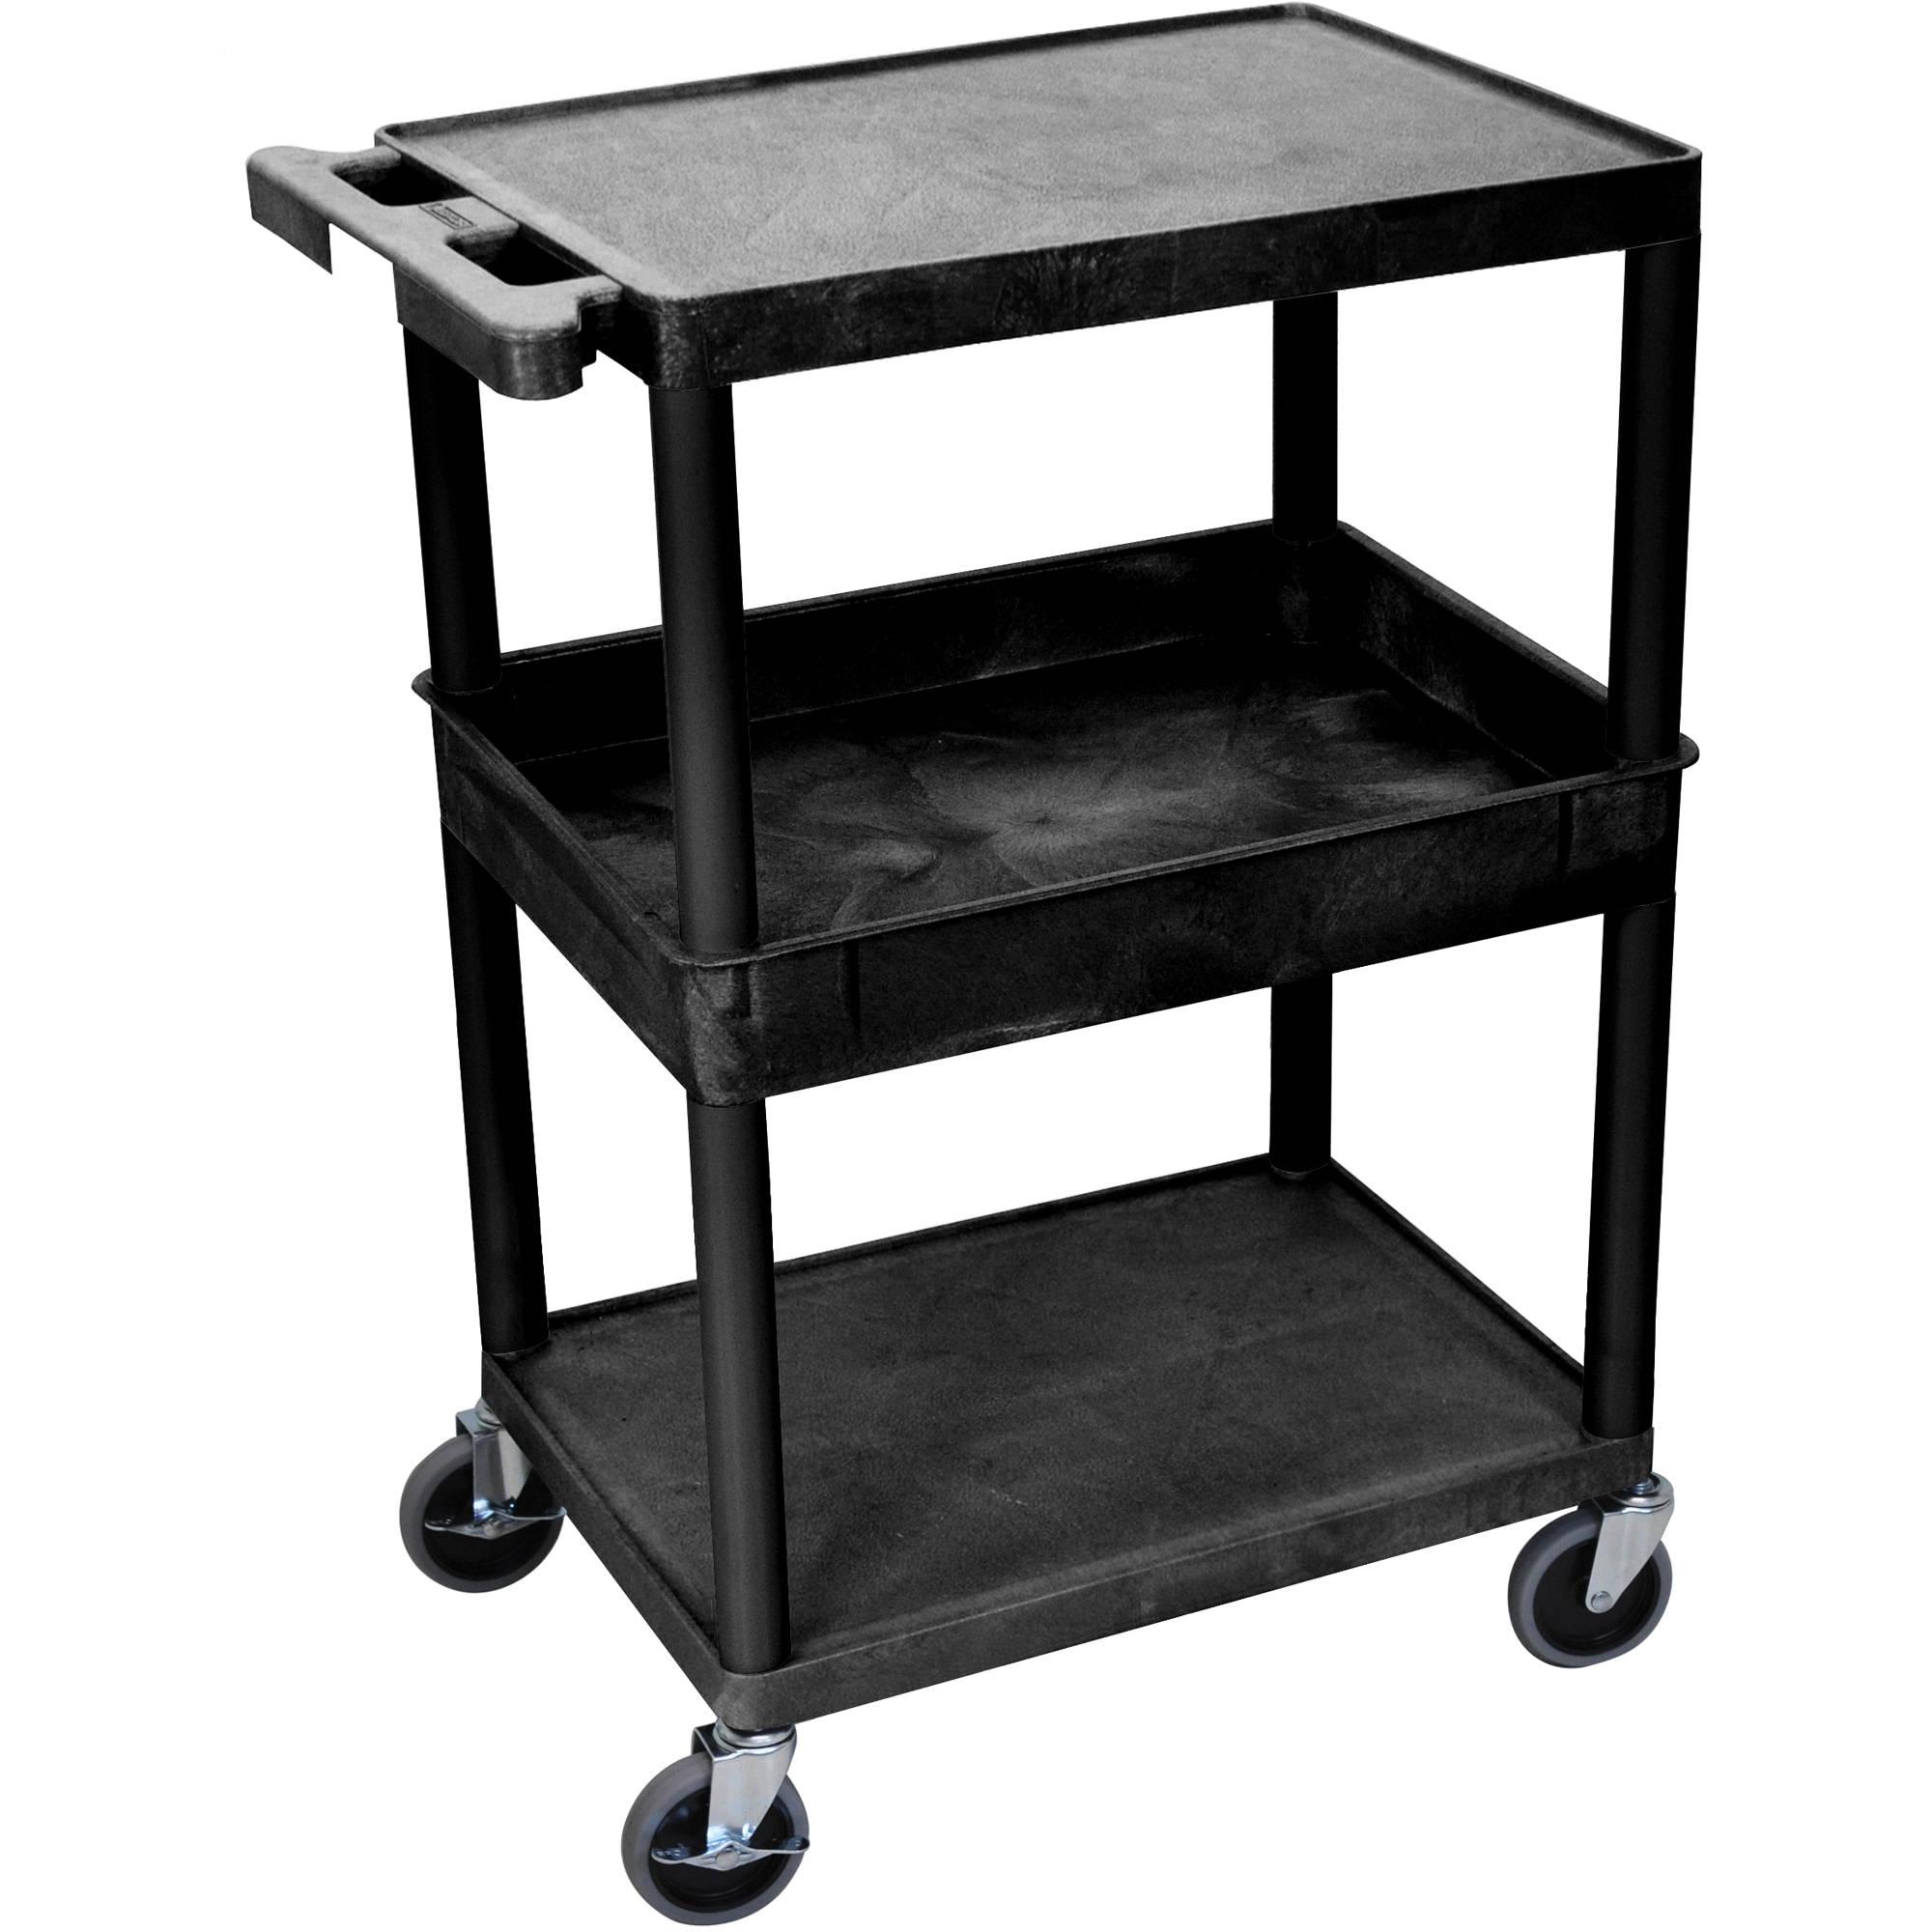 luxor stc212 24 x 18 three shelf utility cart stc212 b b h. Black Bedroom Furniture Sets. Home Design Ideas